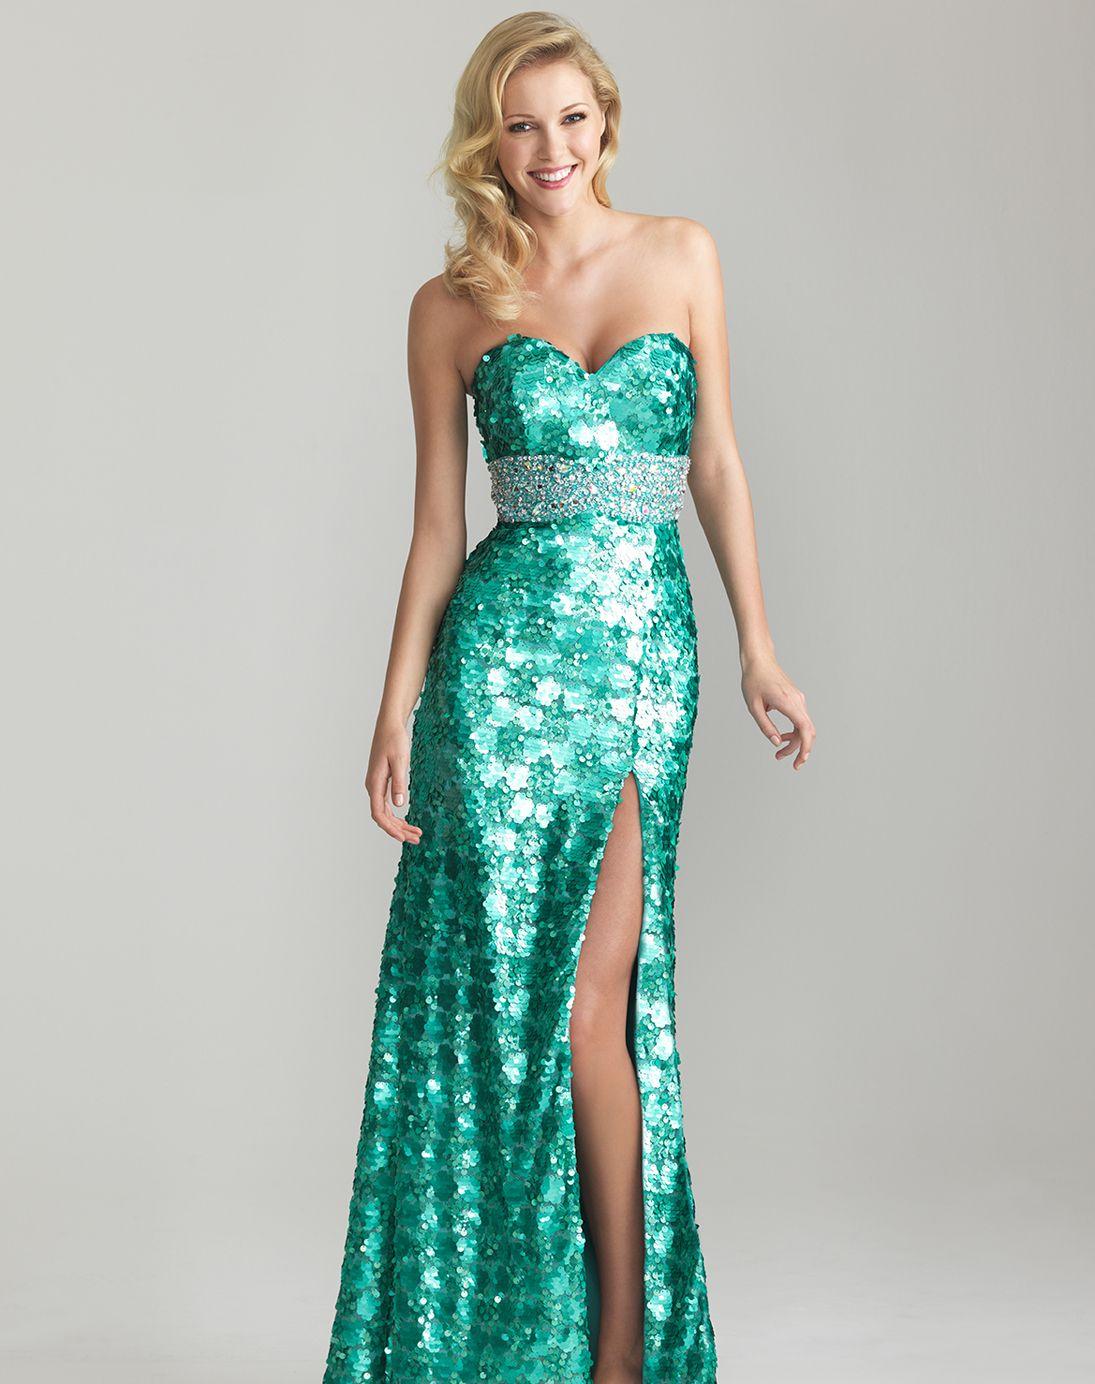 Aqua Sequin Sweetheart Rhinestone Empire Waist Prom Dress - Unique ...